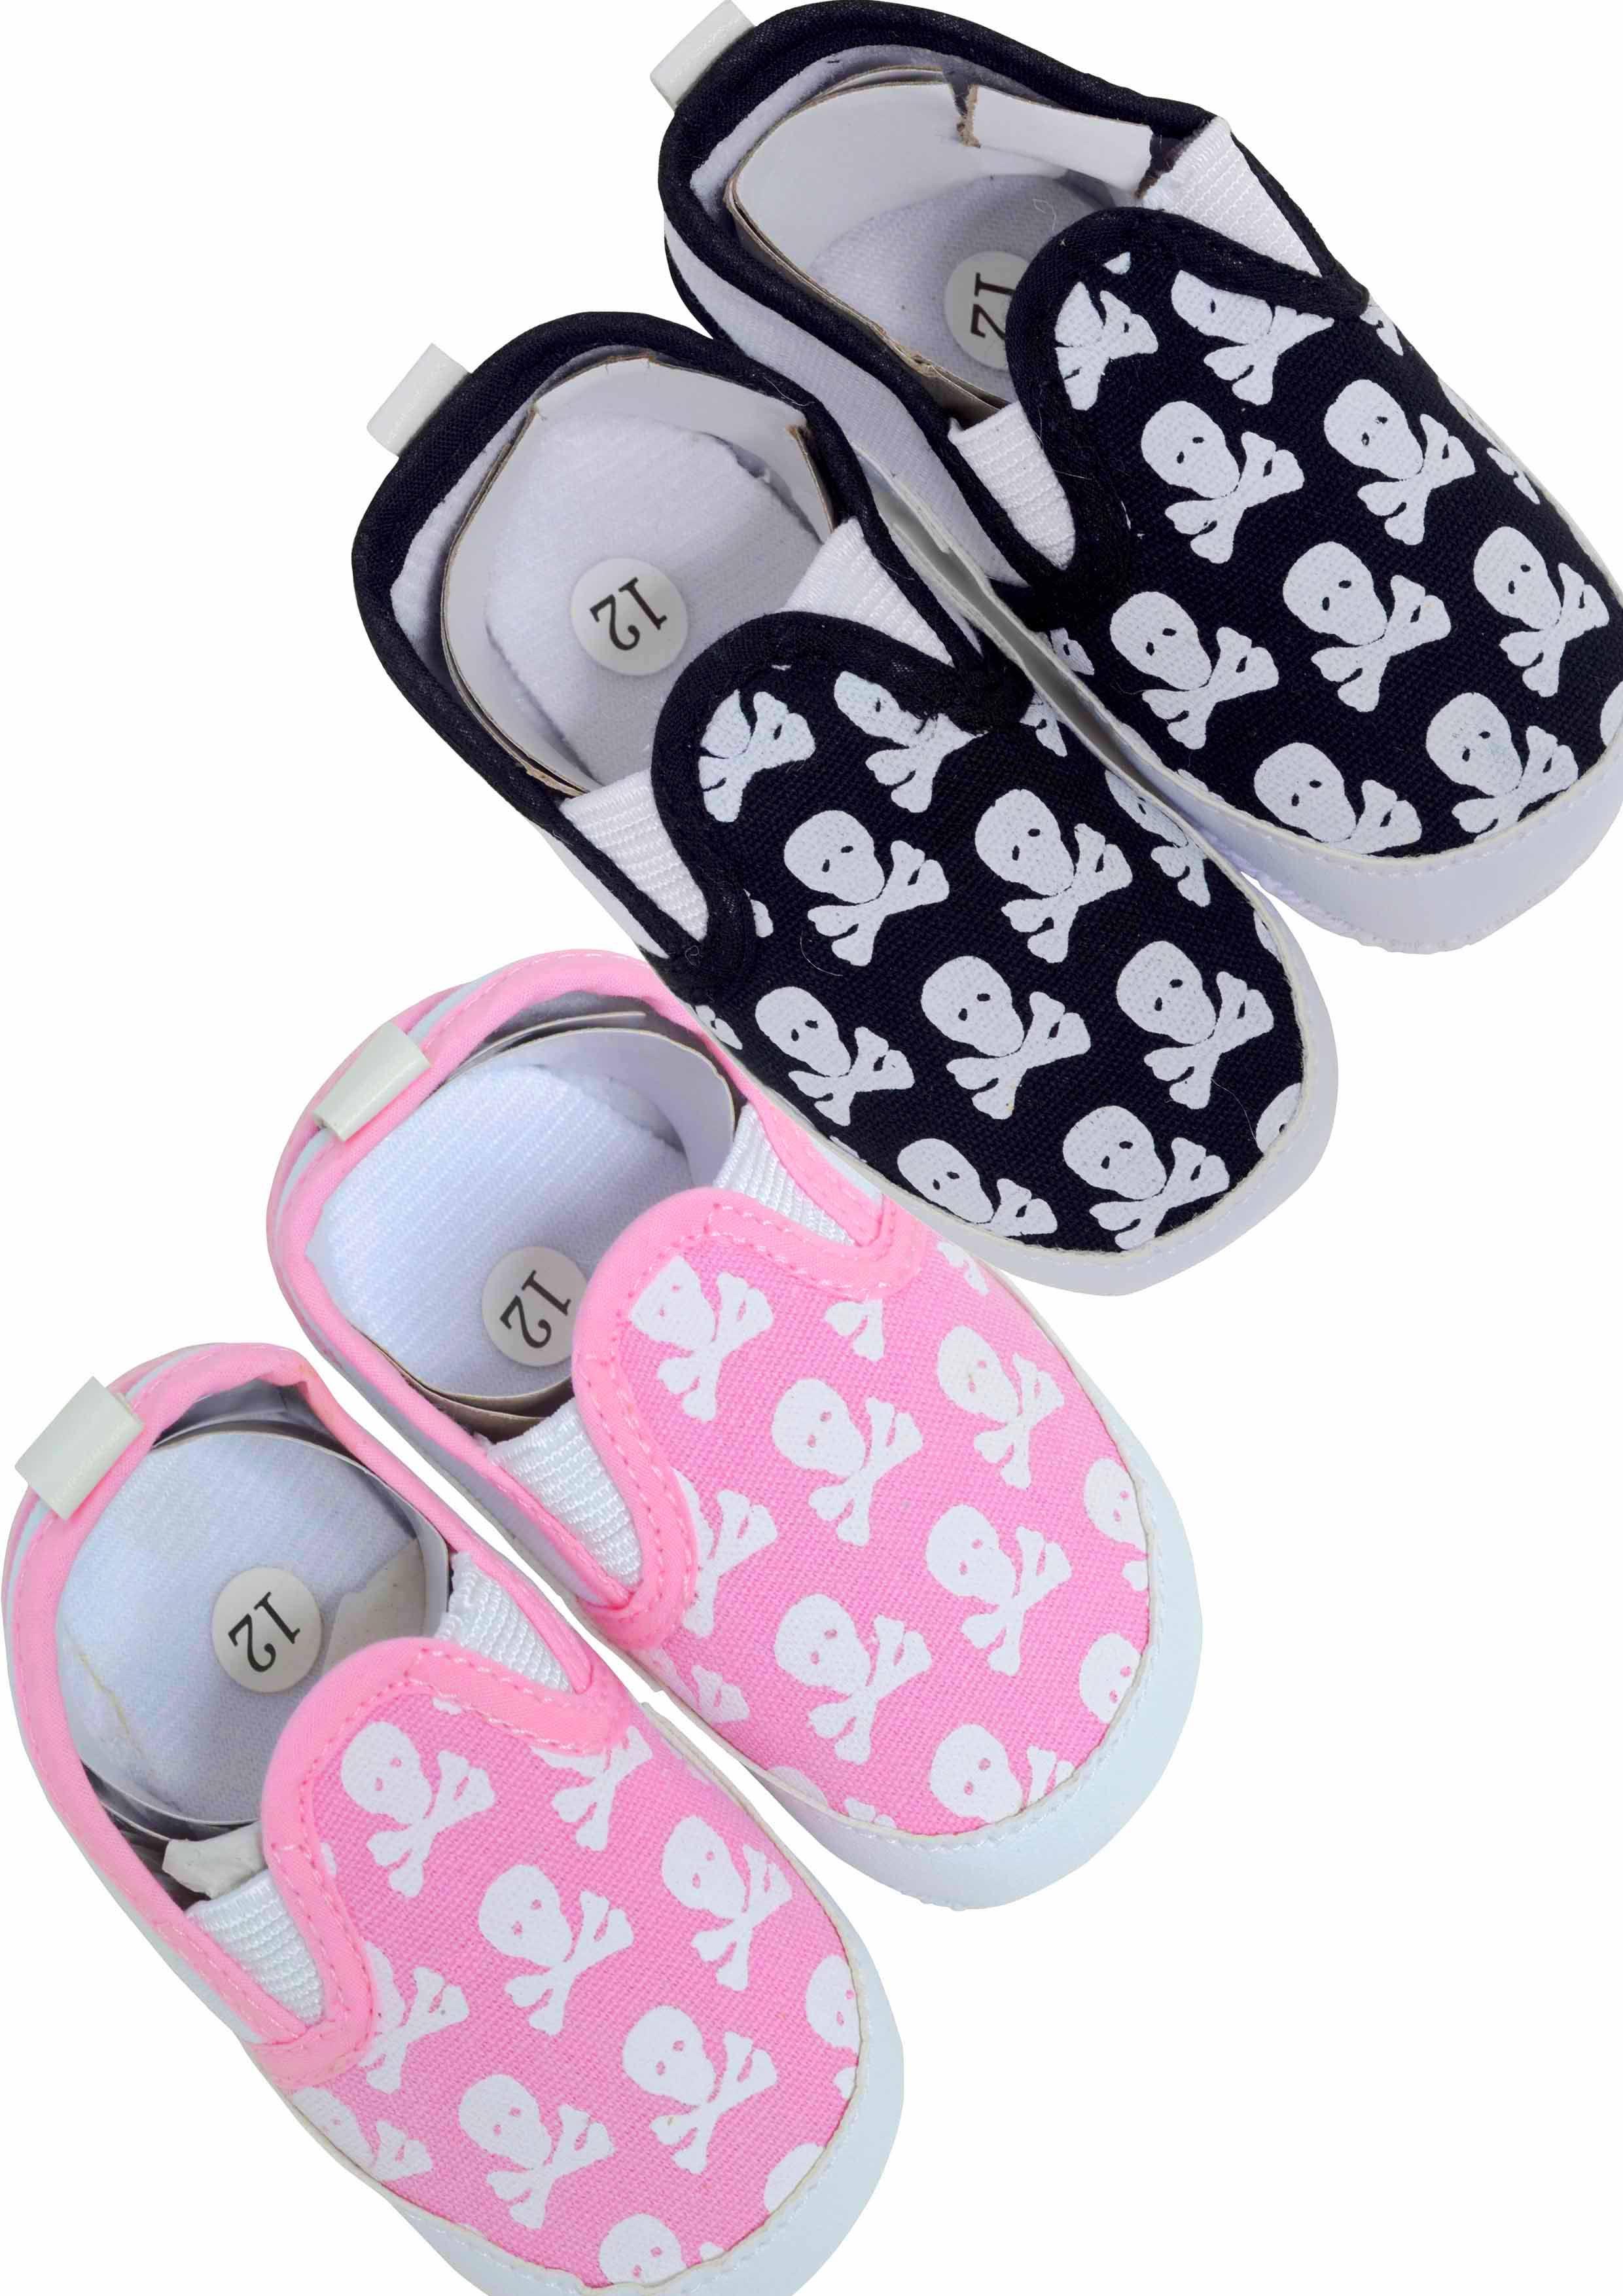 Skull & Crossbones Cool Baby Shoes